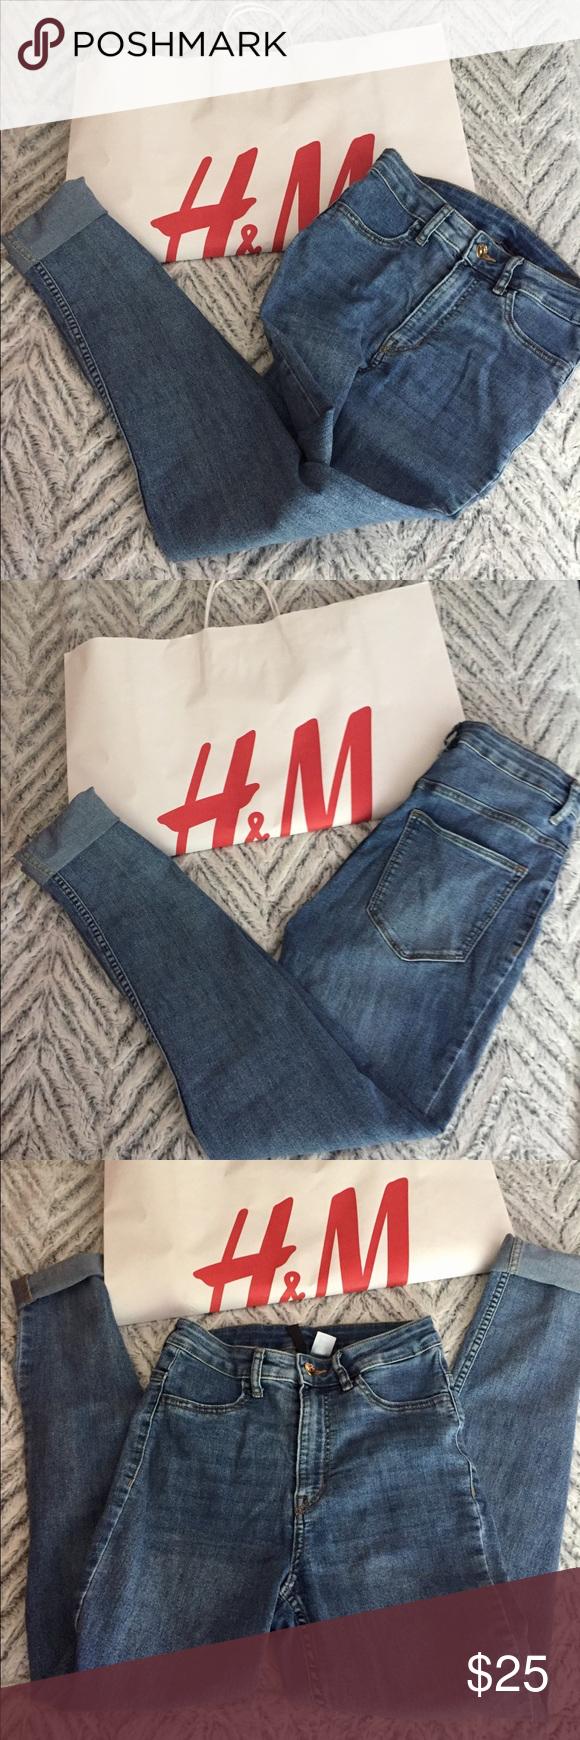 ☑️H&M Light Blue Skinny Jean 👖 Light blue skinny jeans